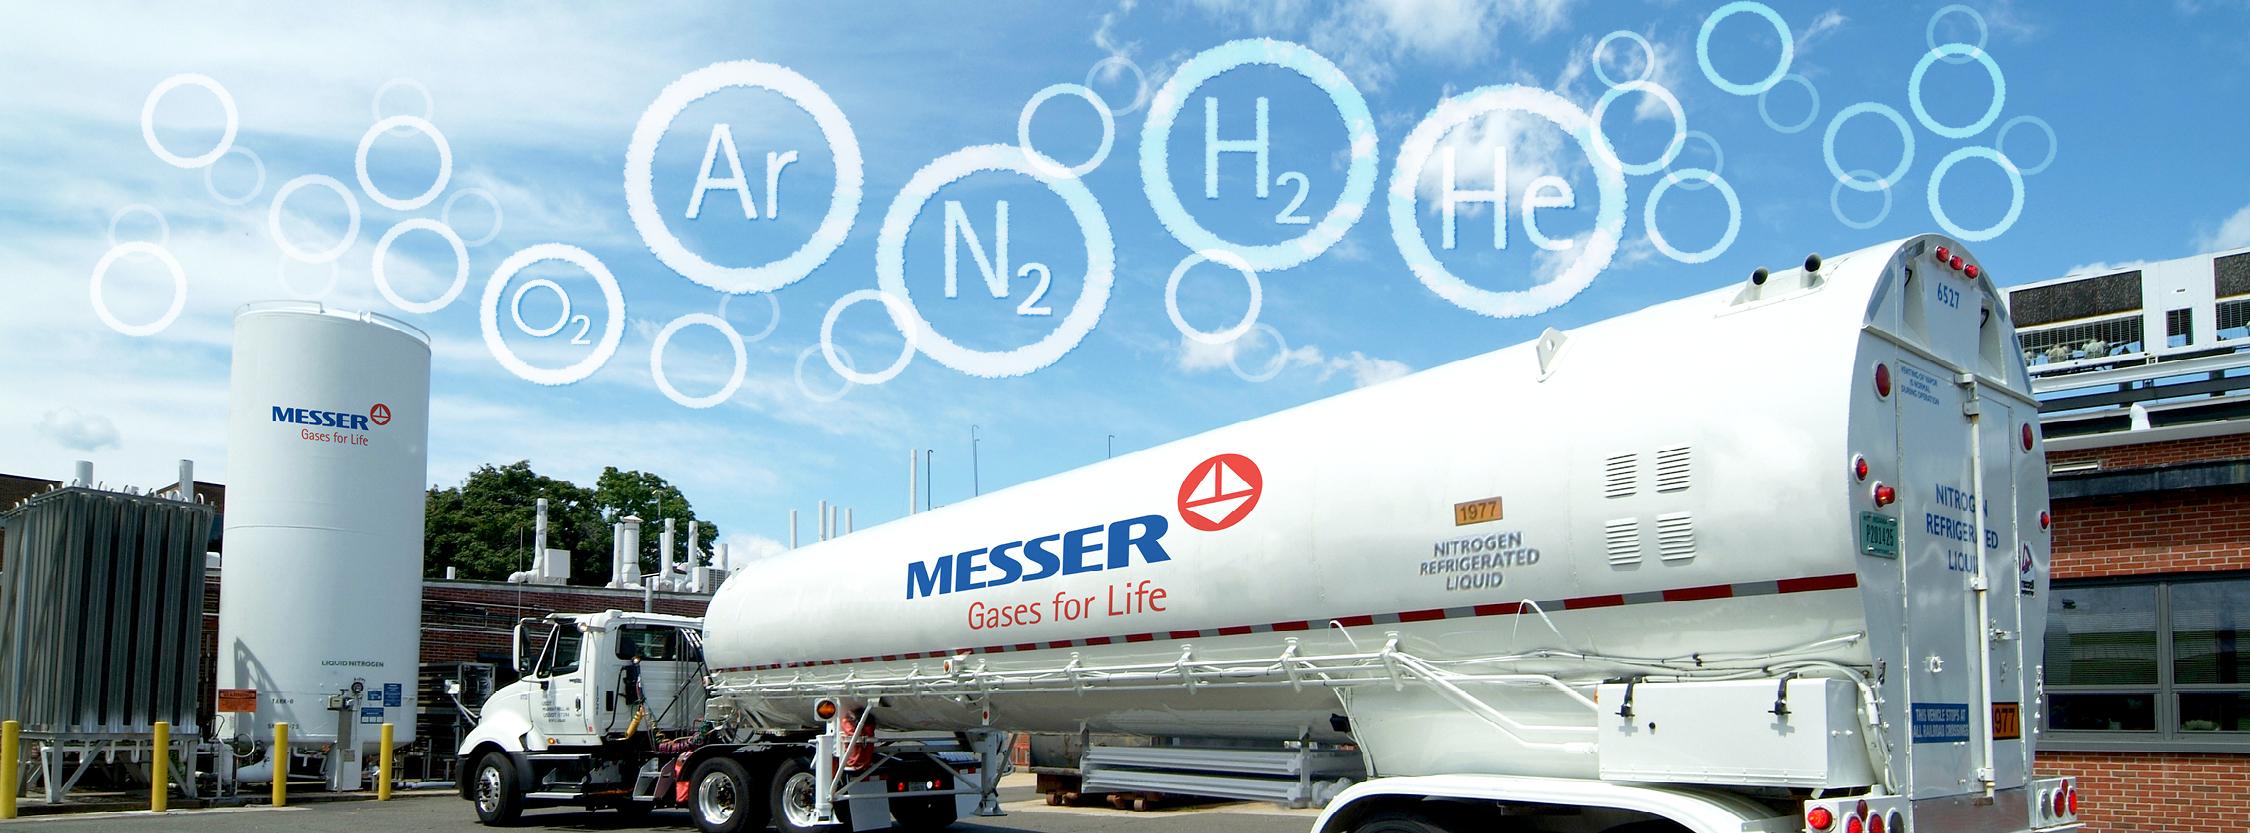 MESS-3010-HeatTreatEBlastHeader